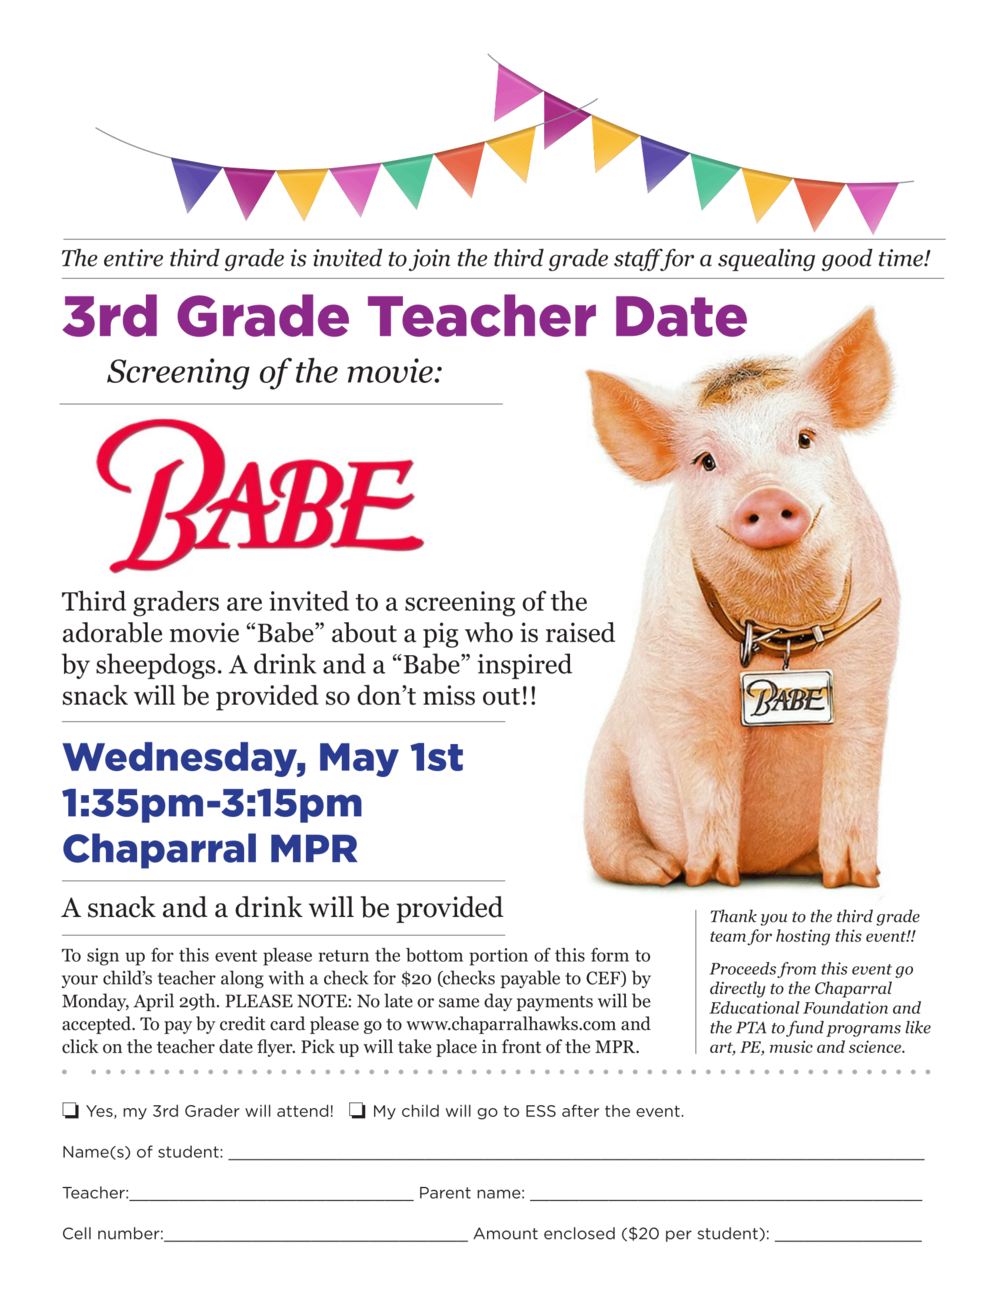 3rd Grade Date2 (2)-1.png